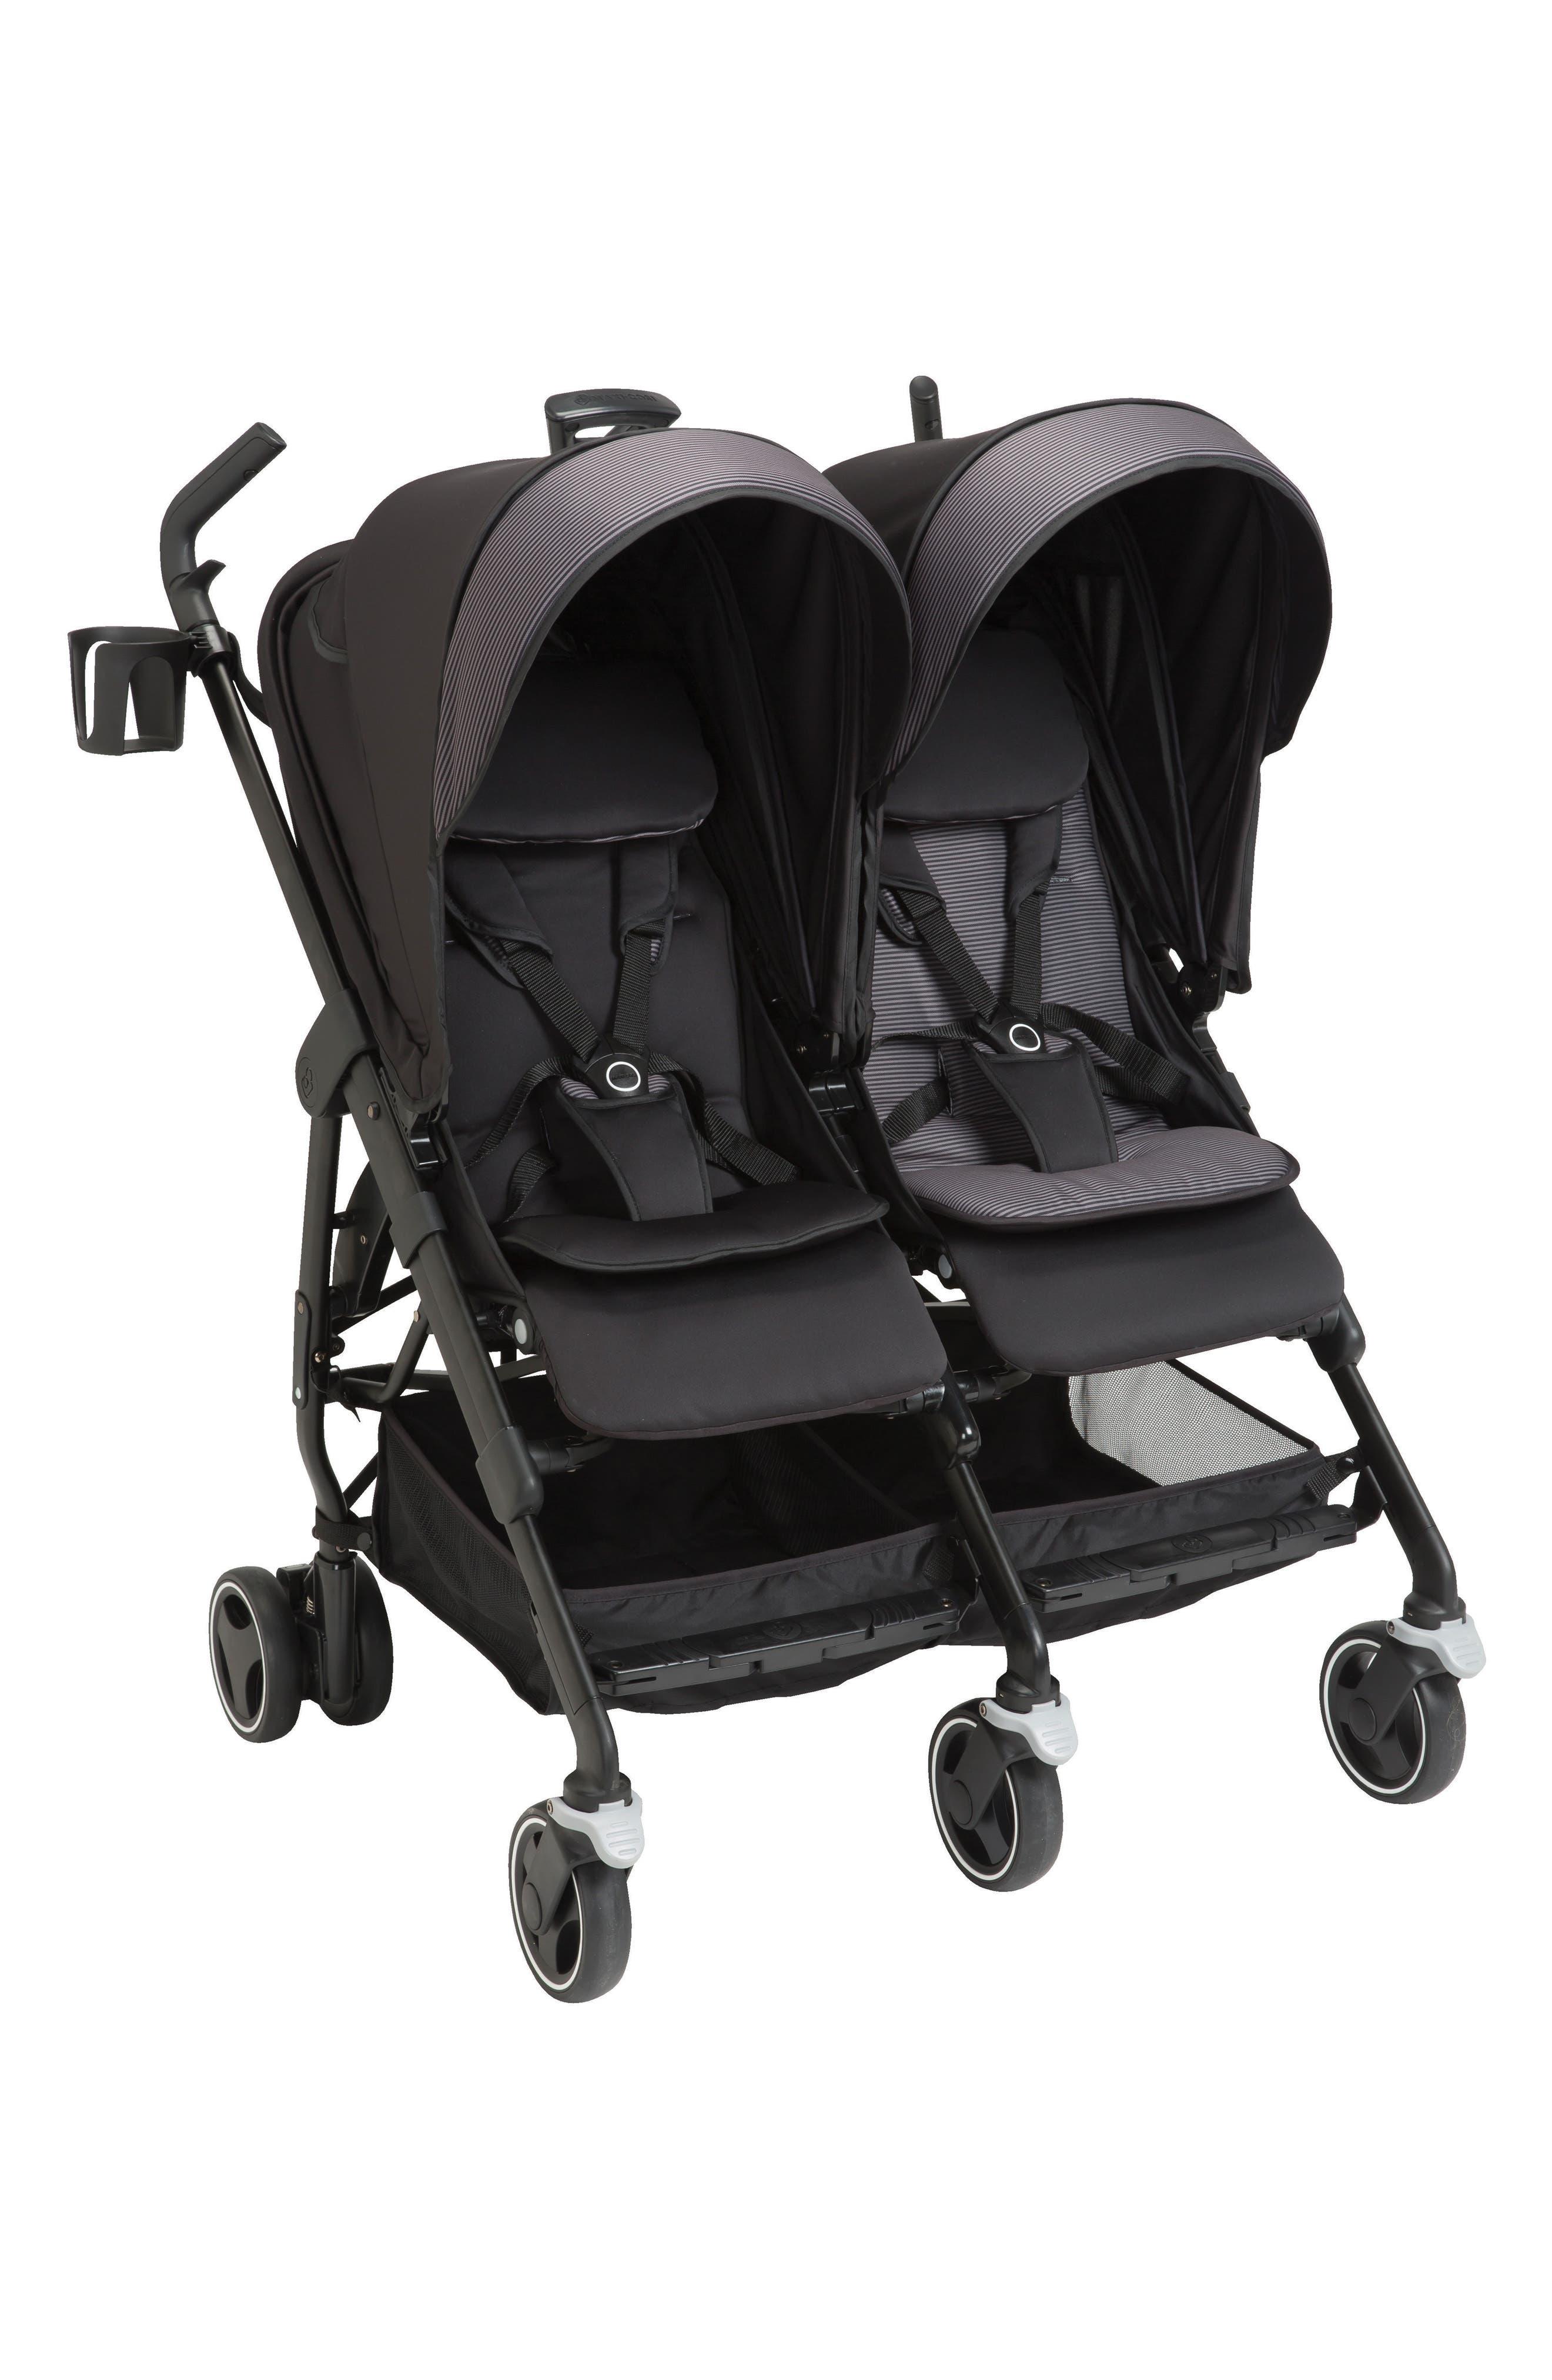 Main Image - Maxi-Cosi® Dana For2 Double Stroller